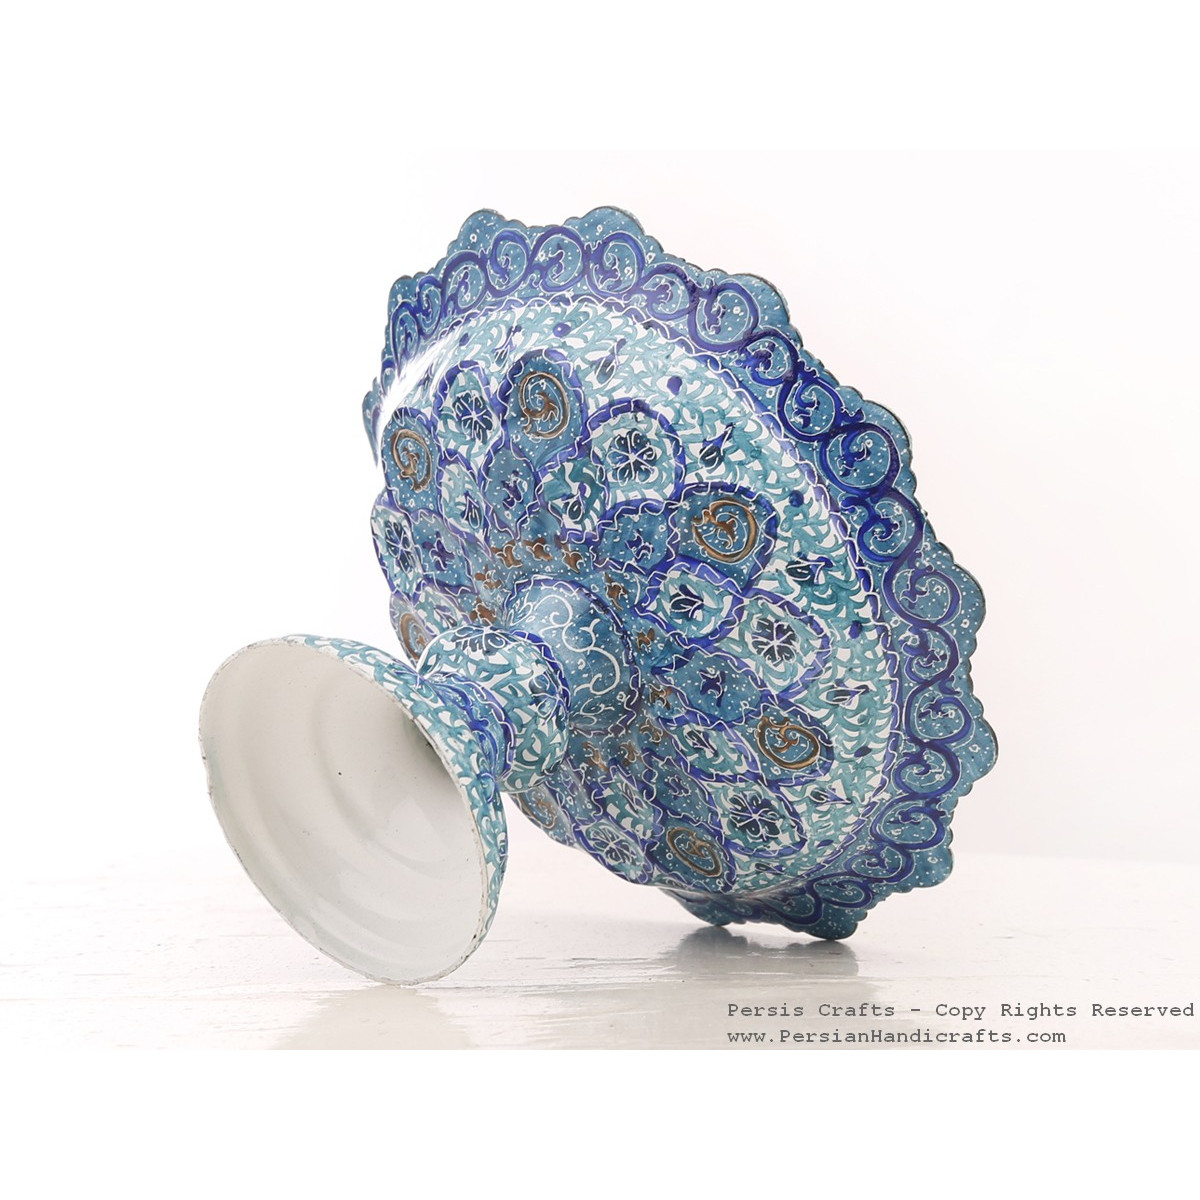 Enamel (Minakari) Pedestal Compote Candy Dish - HE3041-Persian Handicrafts